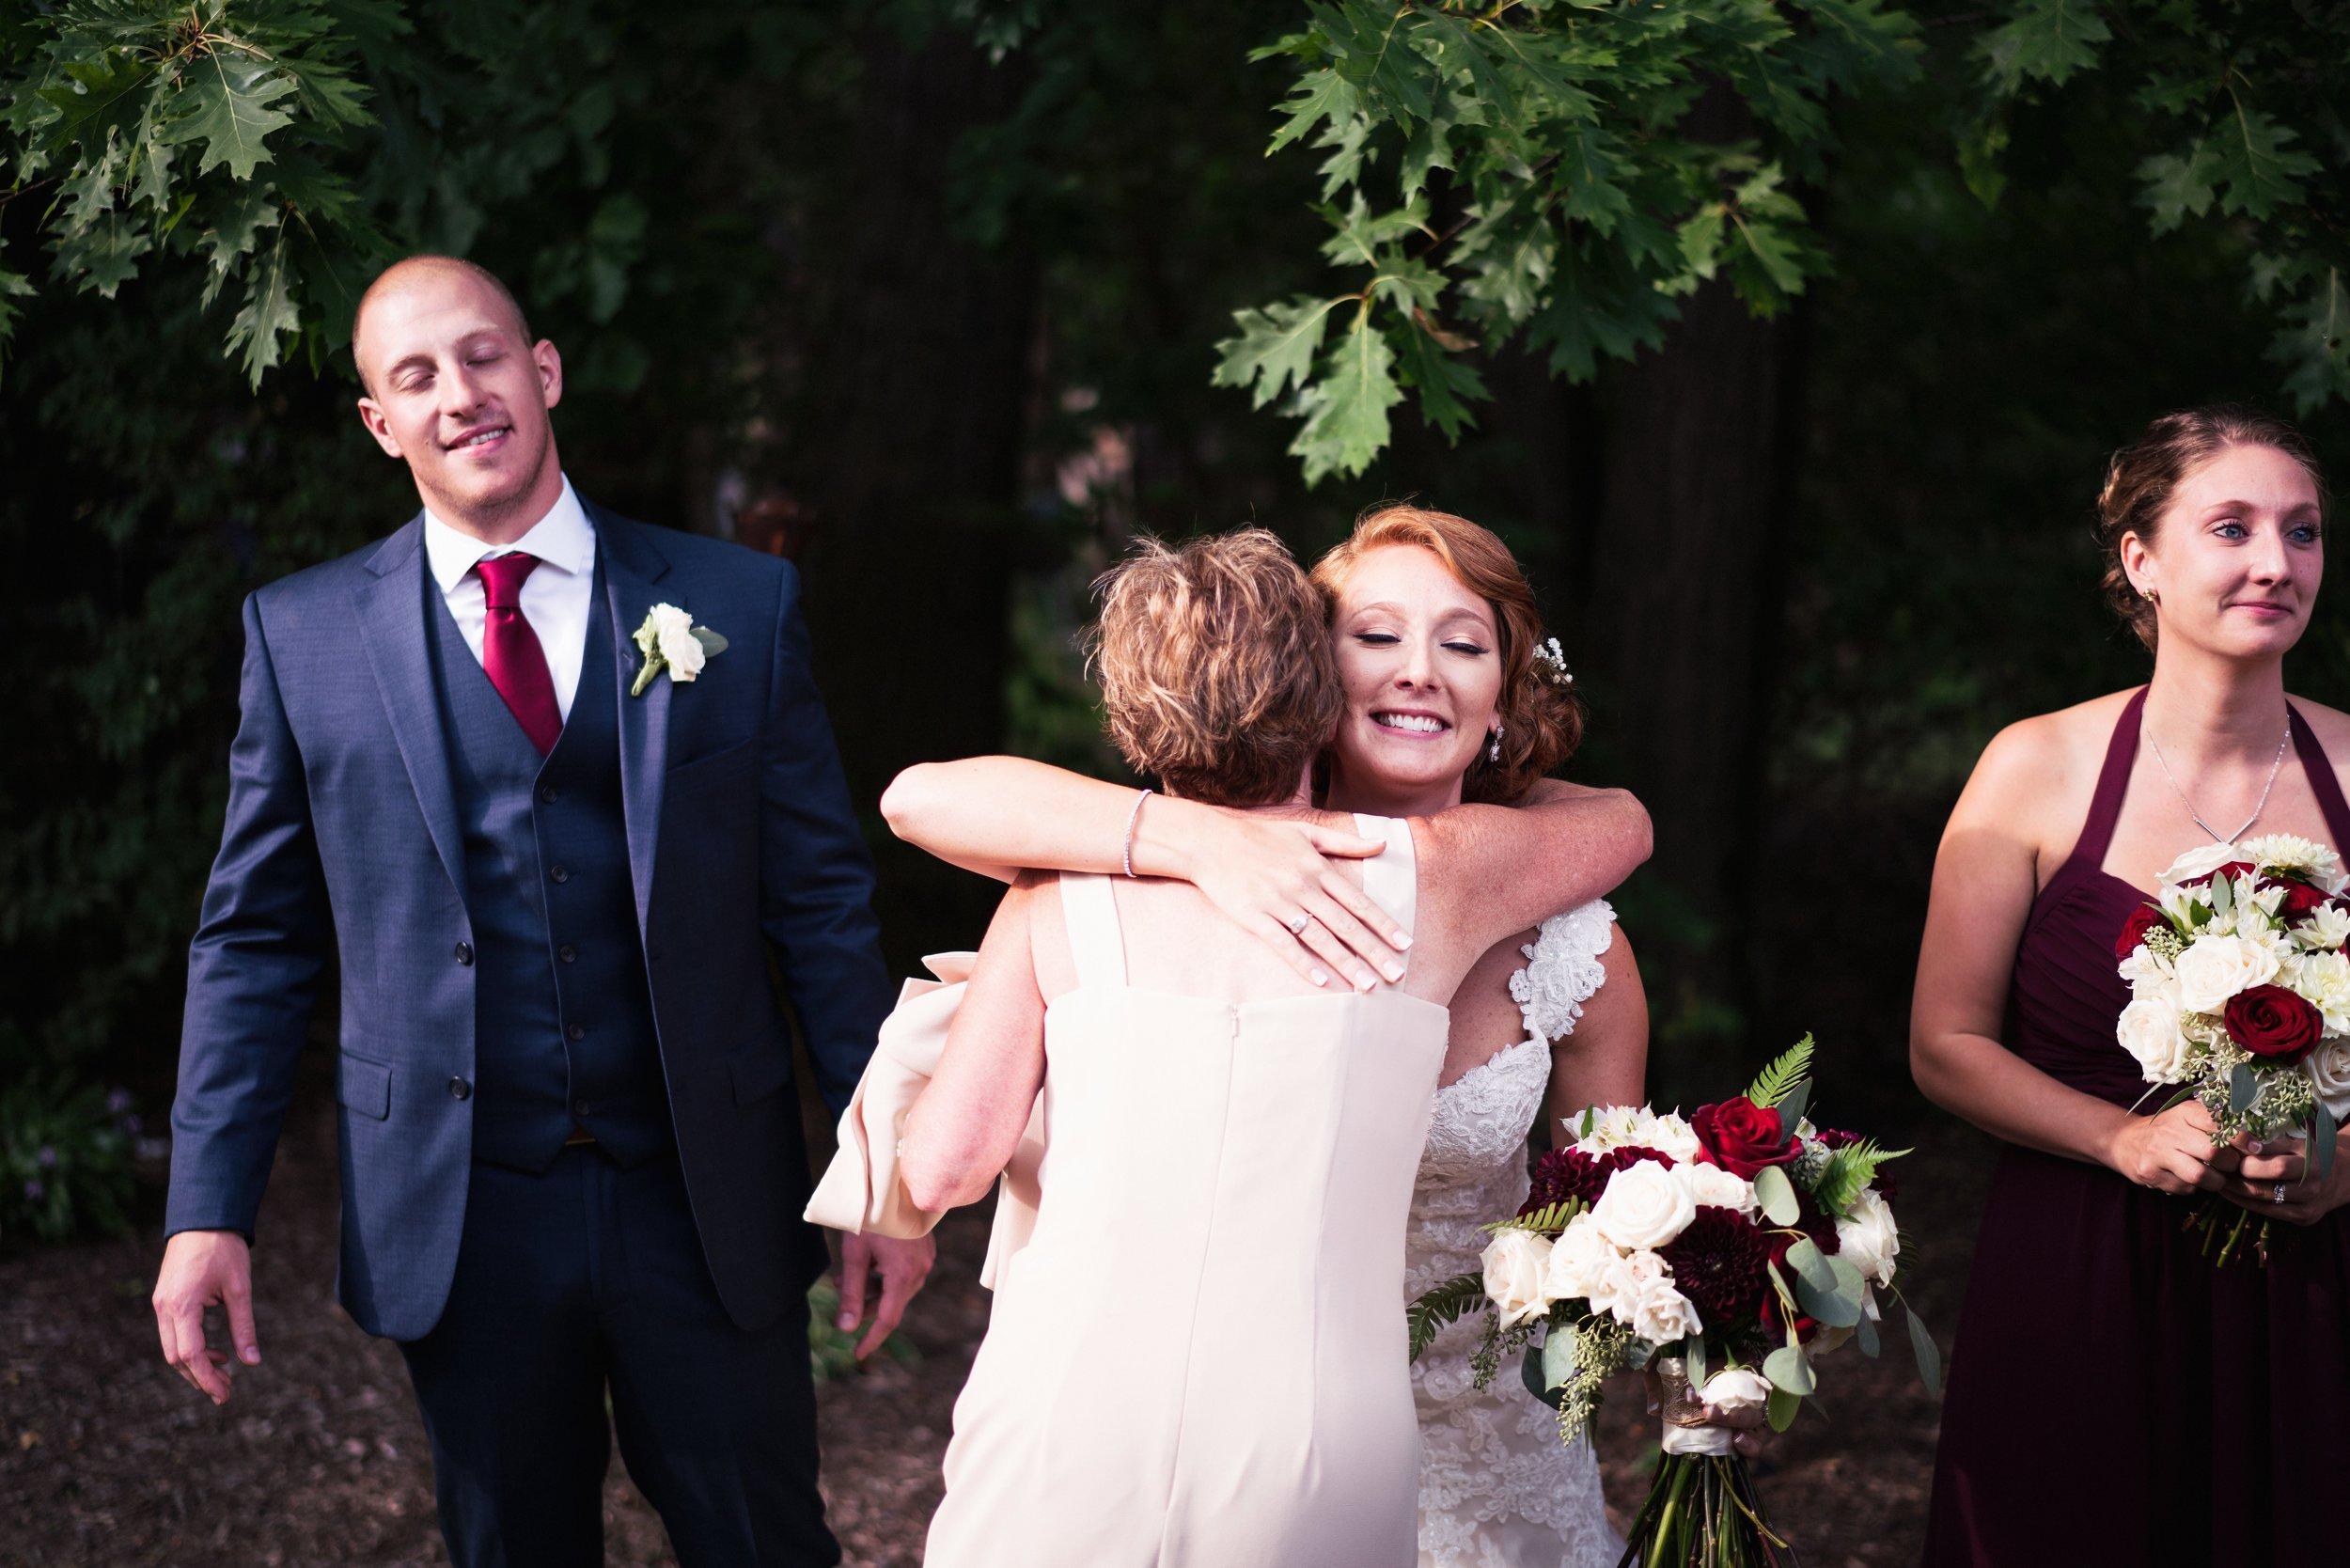 Blog-Lisa-James-Wedding-at Rosebud Estate Weddings in Arcade NY by Stefan-Ludwig-Photography-Buffalo-NY-53-x.jpg